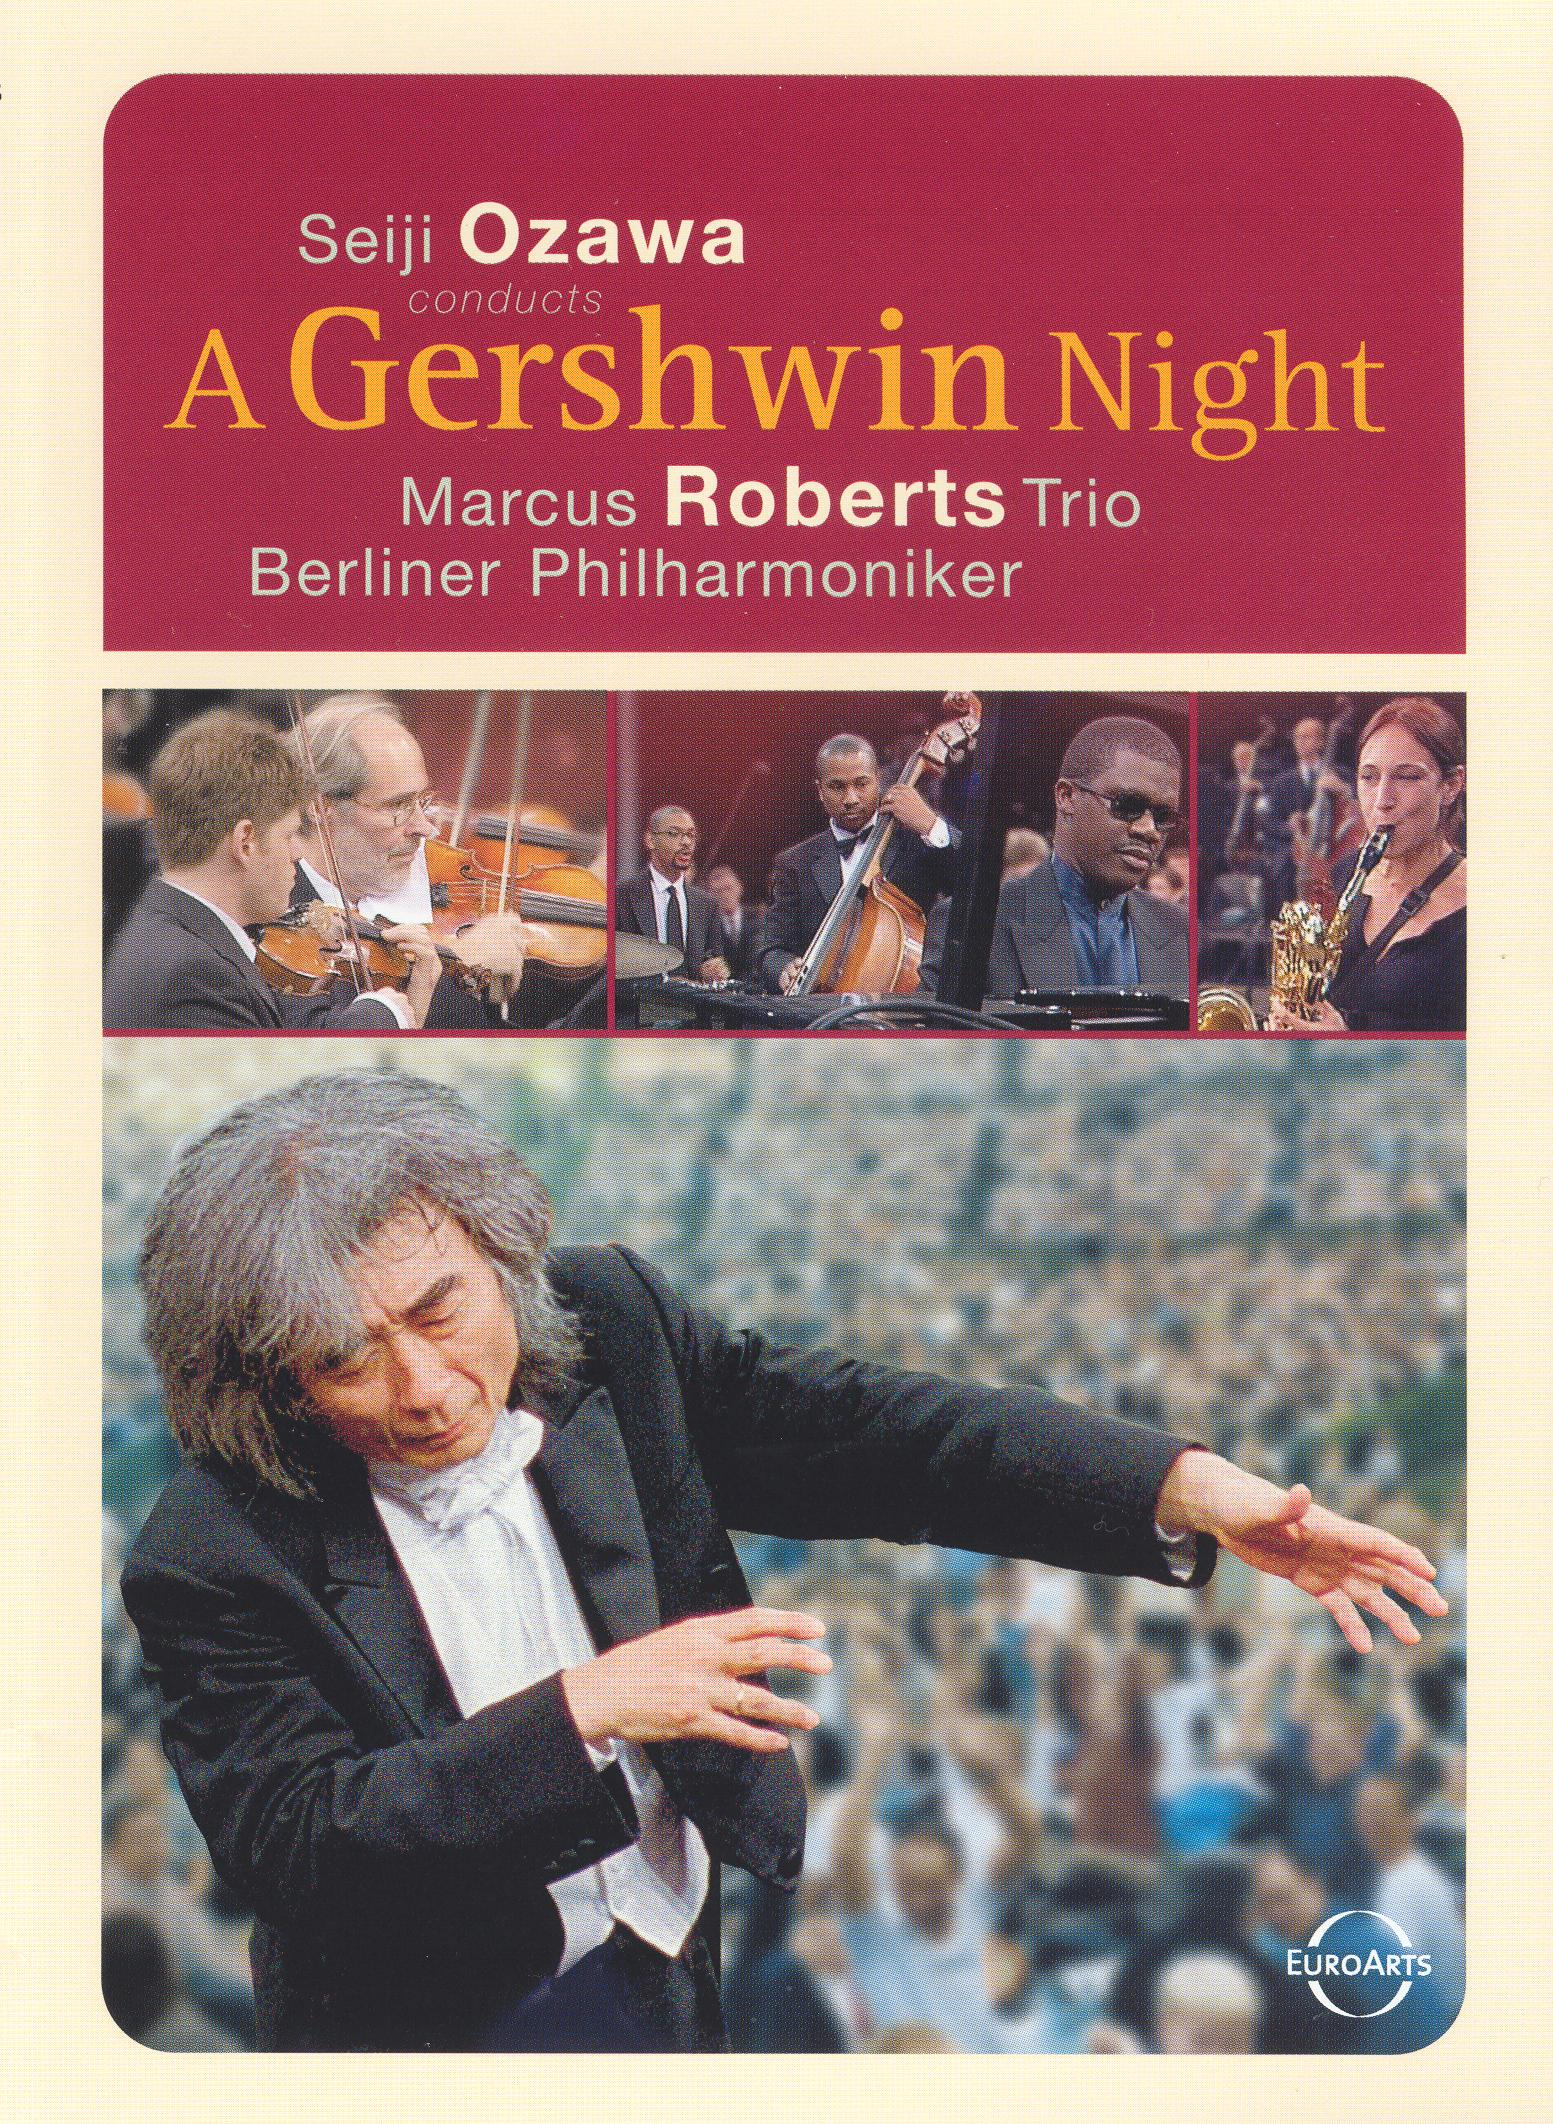 Seiji Ozawa: A Gershwin Night